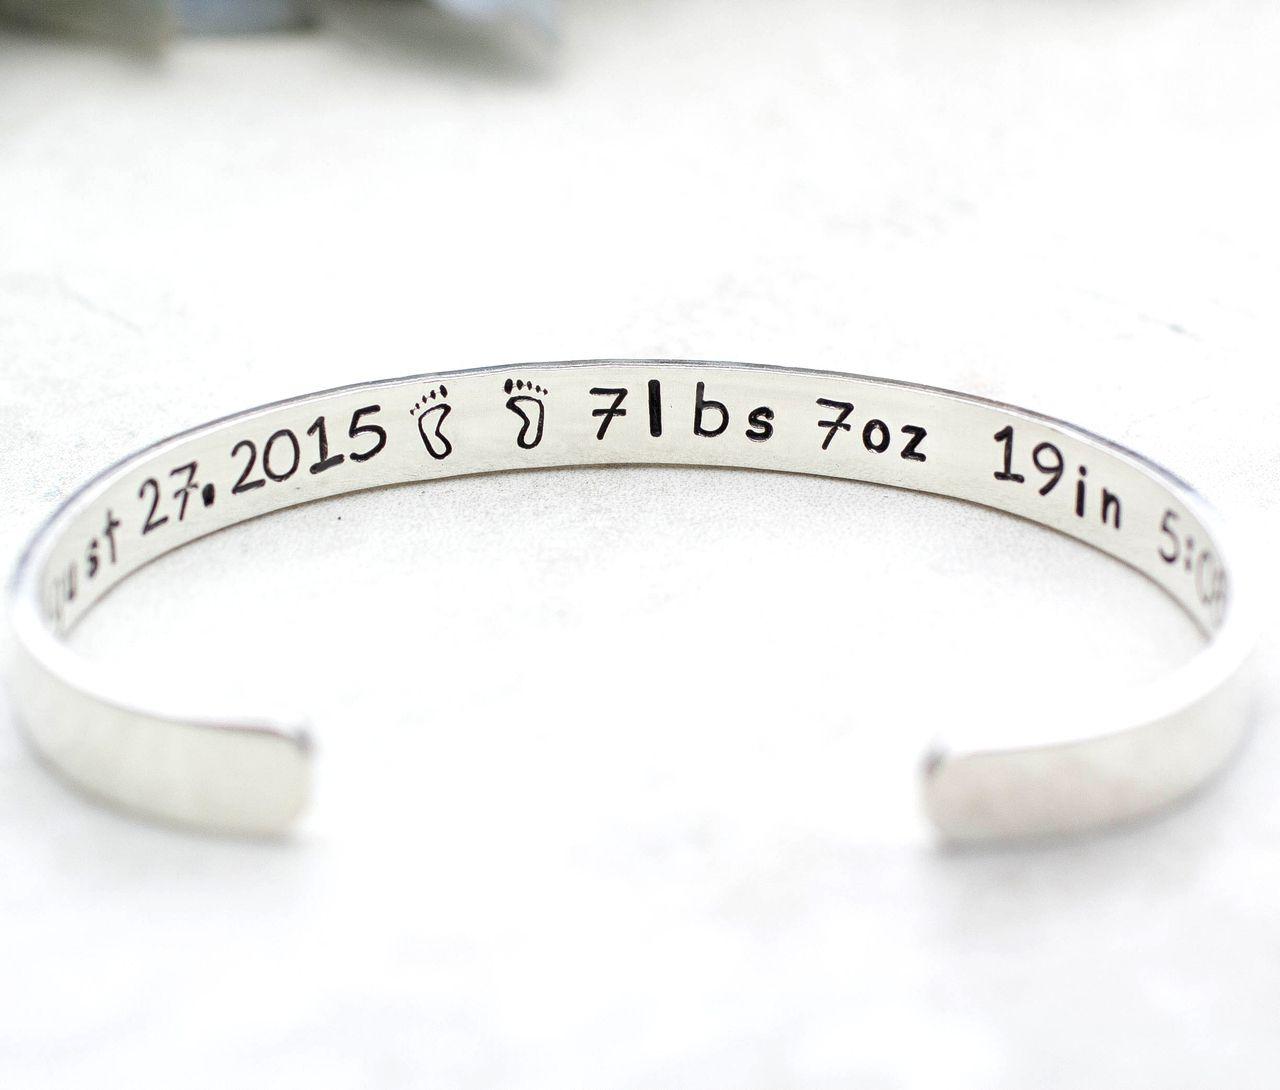 35de8e034 My Sweet Baby Personalized Cuff Bracelet, Sterling Silver | Give Mom ...